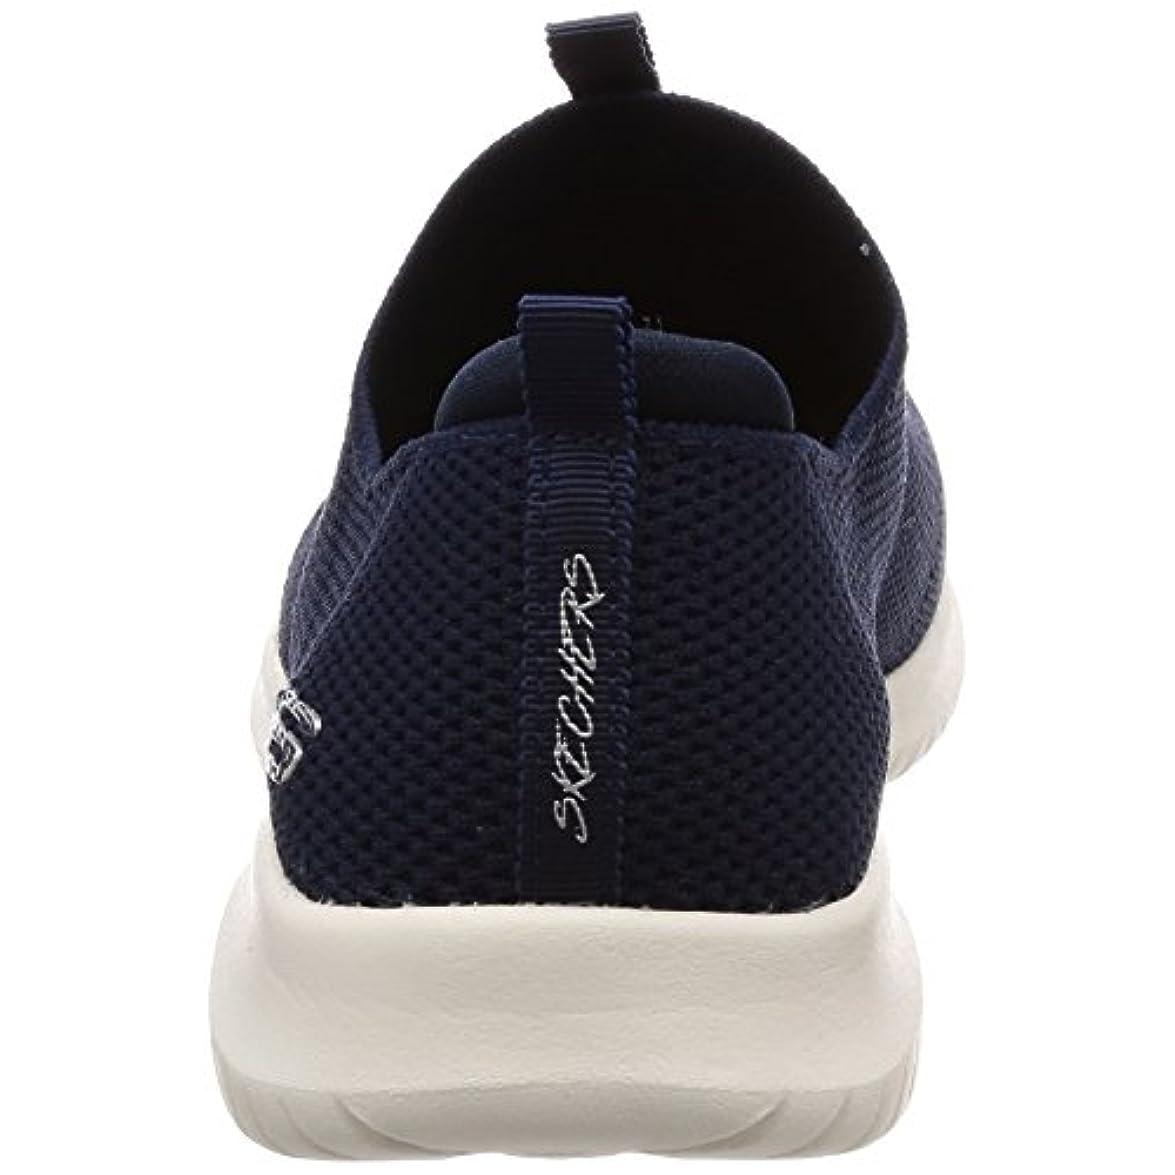 Skechers Ultra Flex-first Take Sneaker Infilare Donna